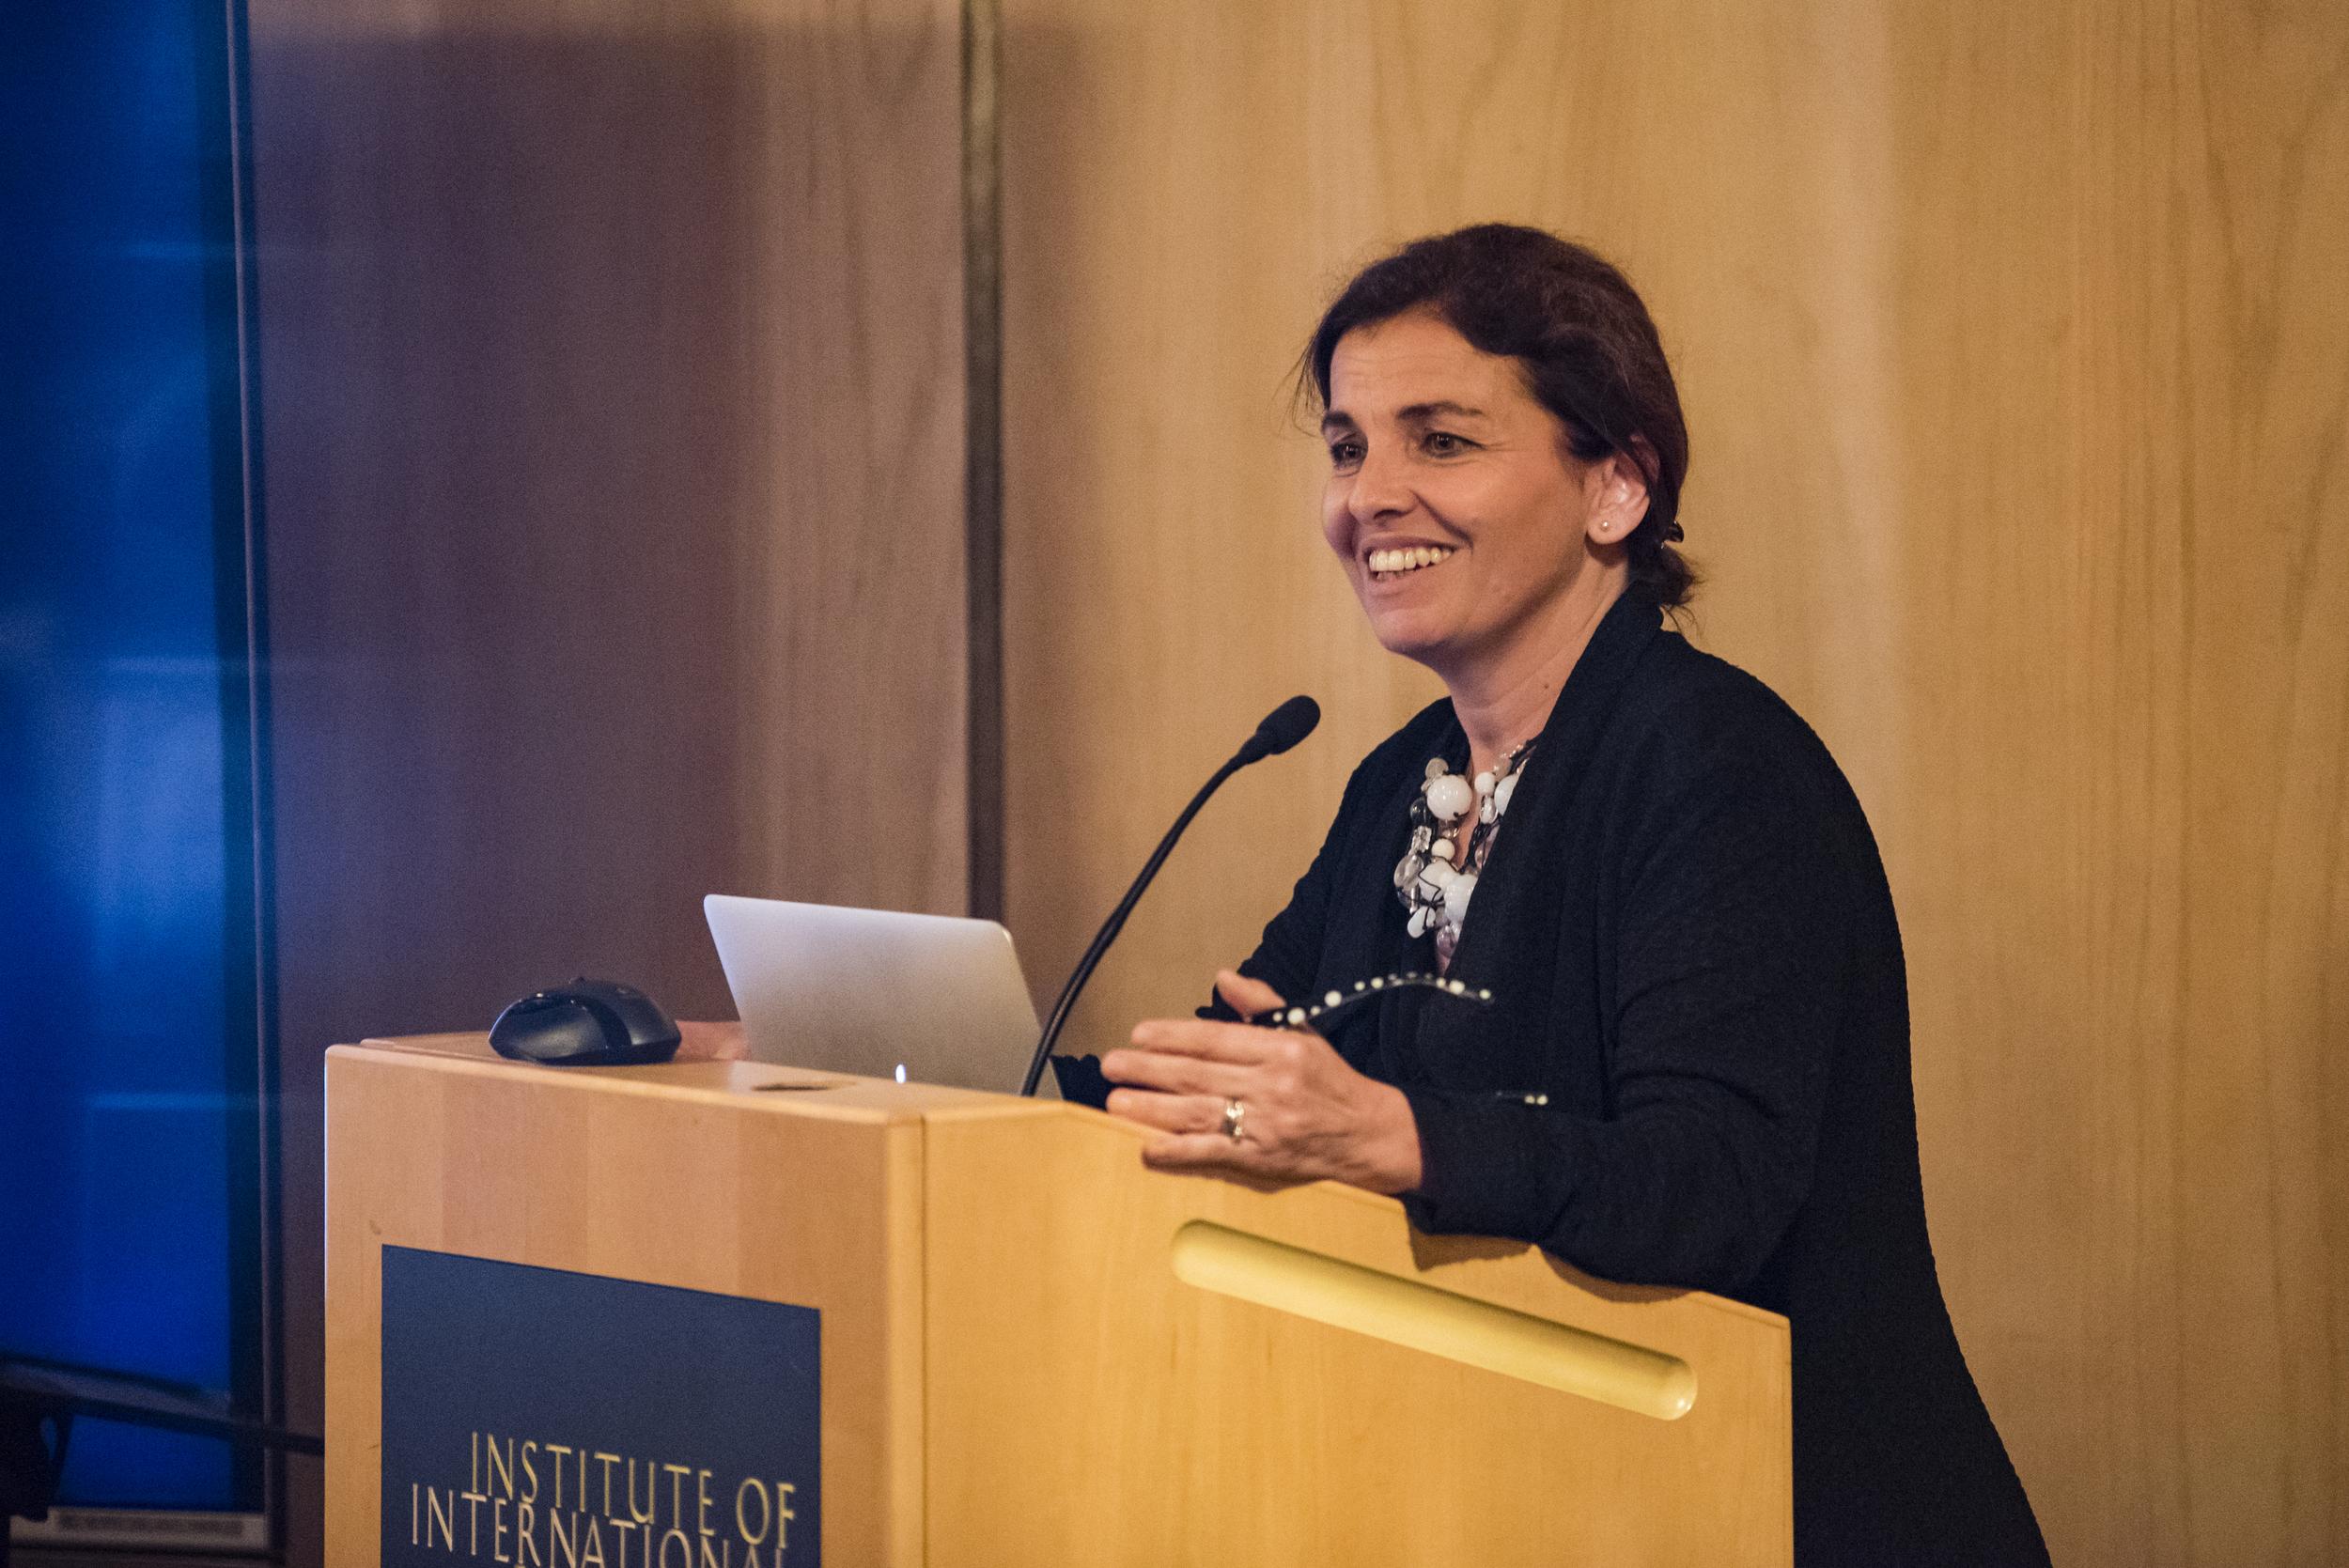 Veronica Boix Mansilla - keynote speaker November 2015 #LINEed